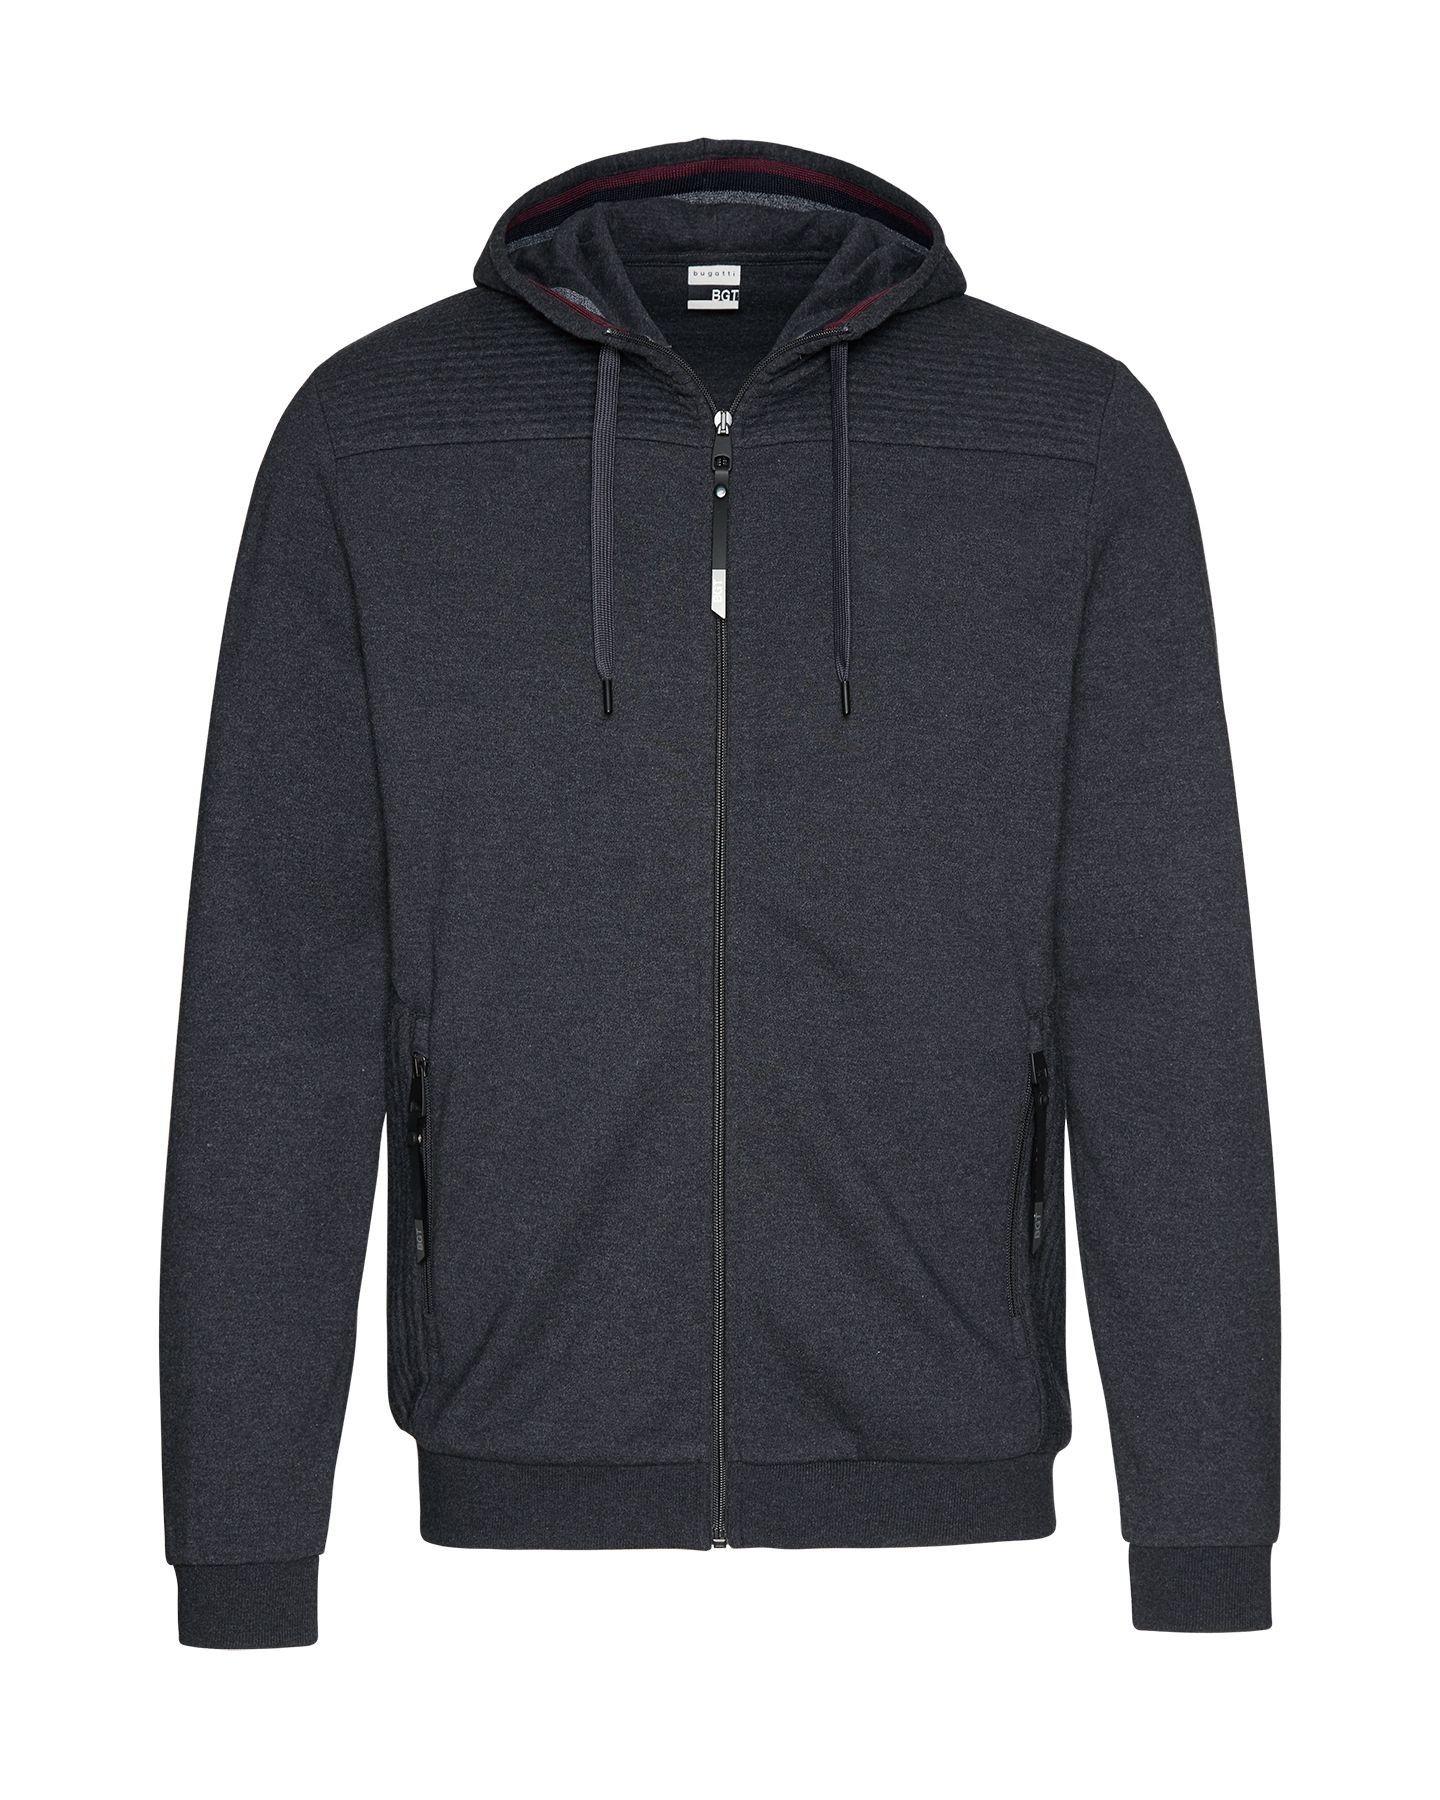 Bugatti - Herren Sweatshirt Jacke mit Kapuze (Art. Nr.: 25084-8750) – Bild 1